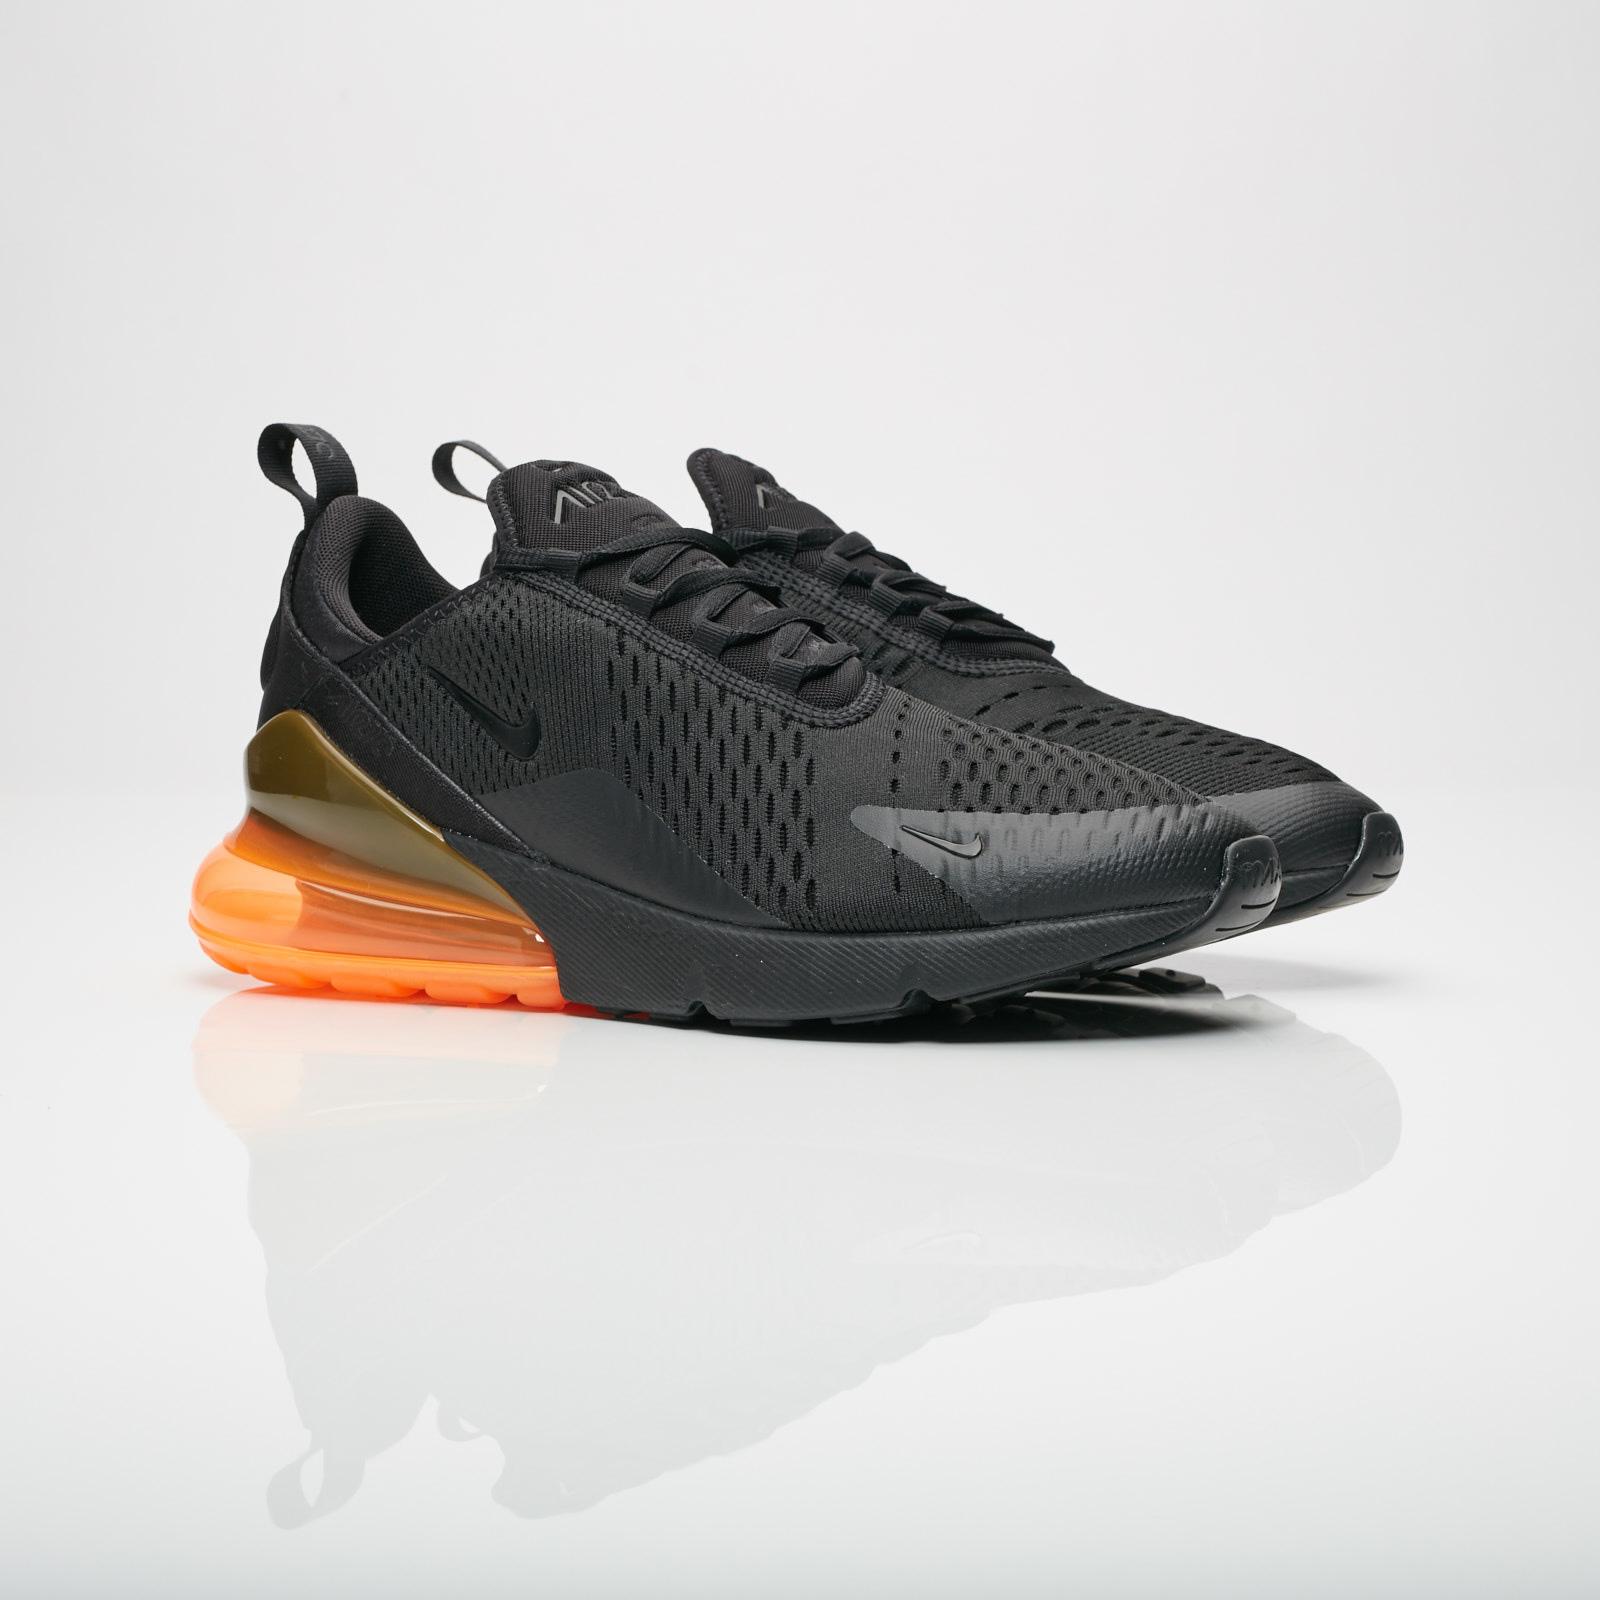 sale retailer 01dfe 9691f Nike Sportswear Air Max 270